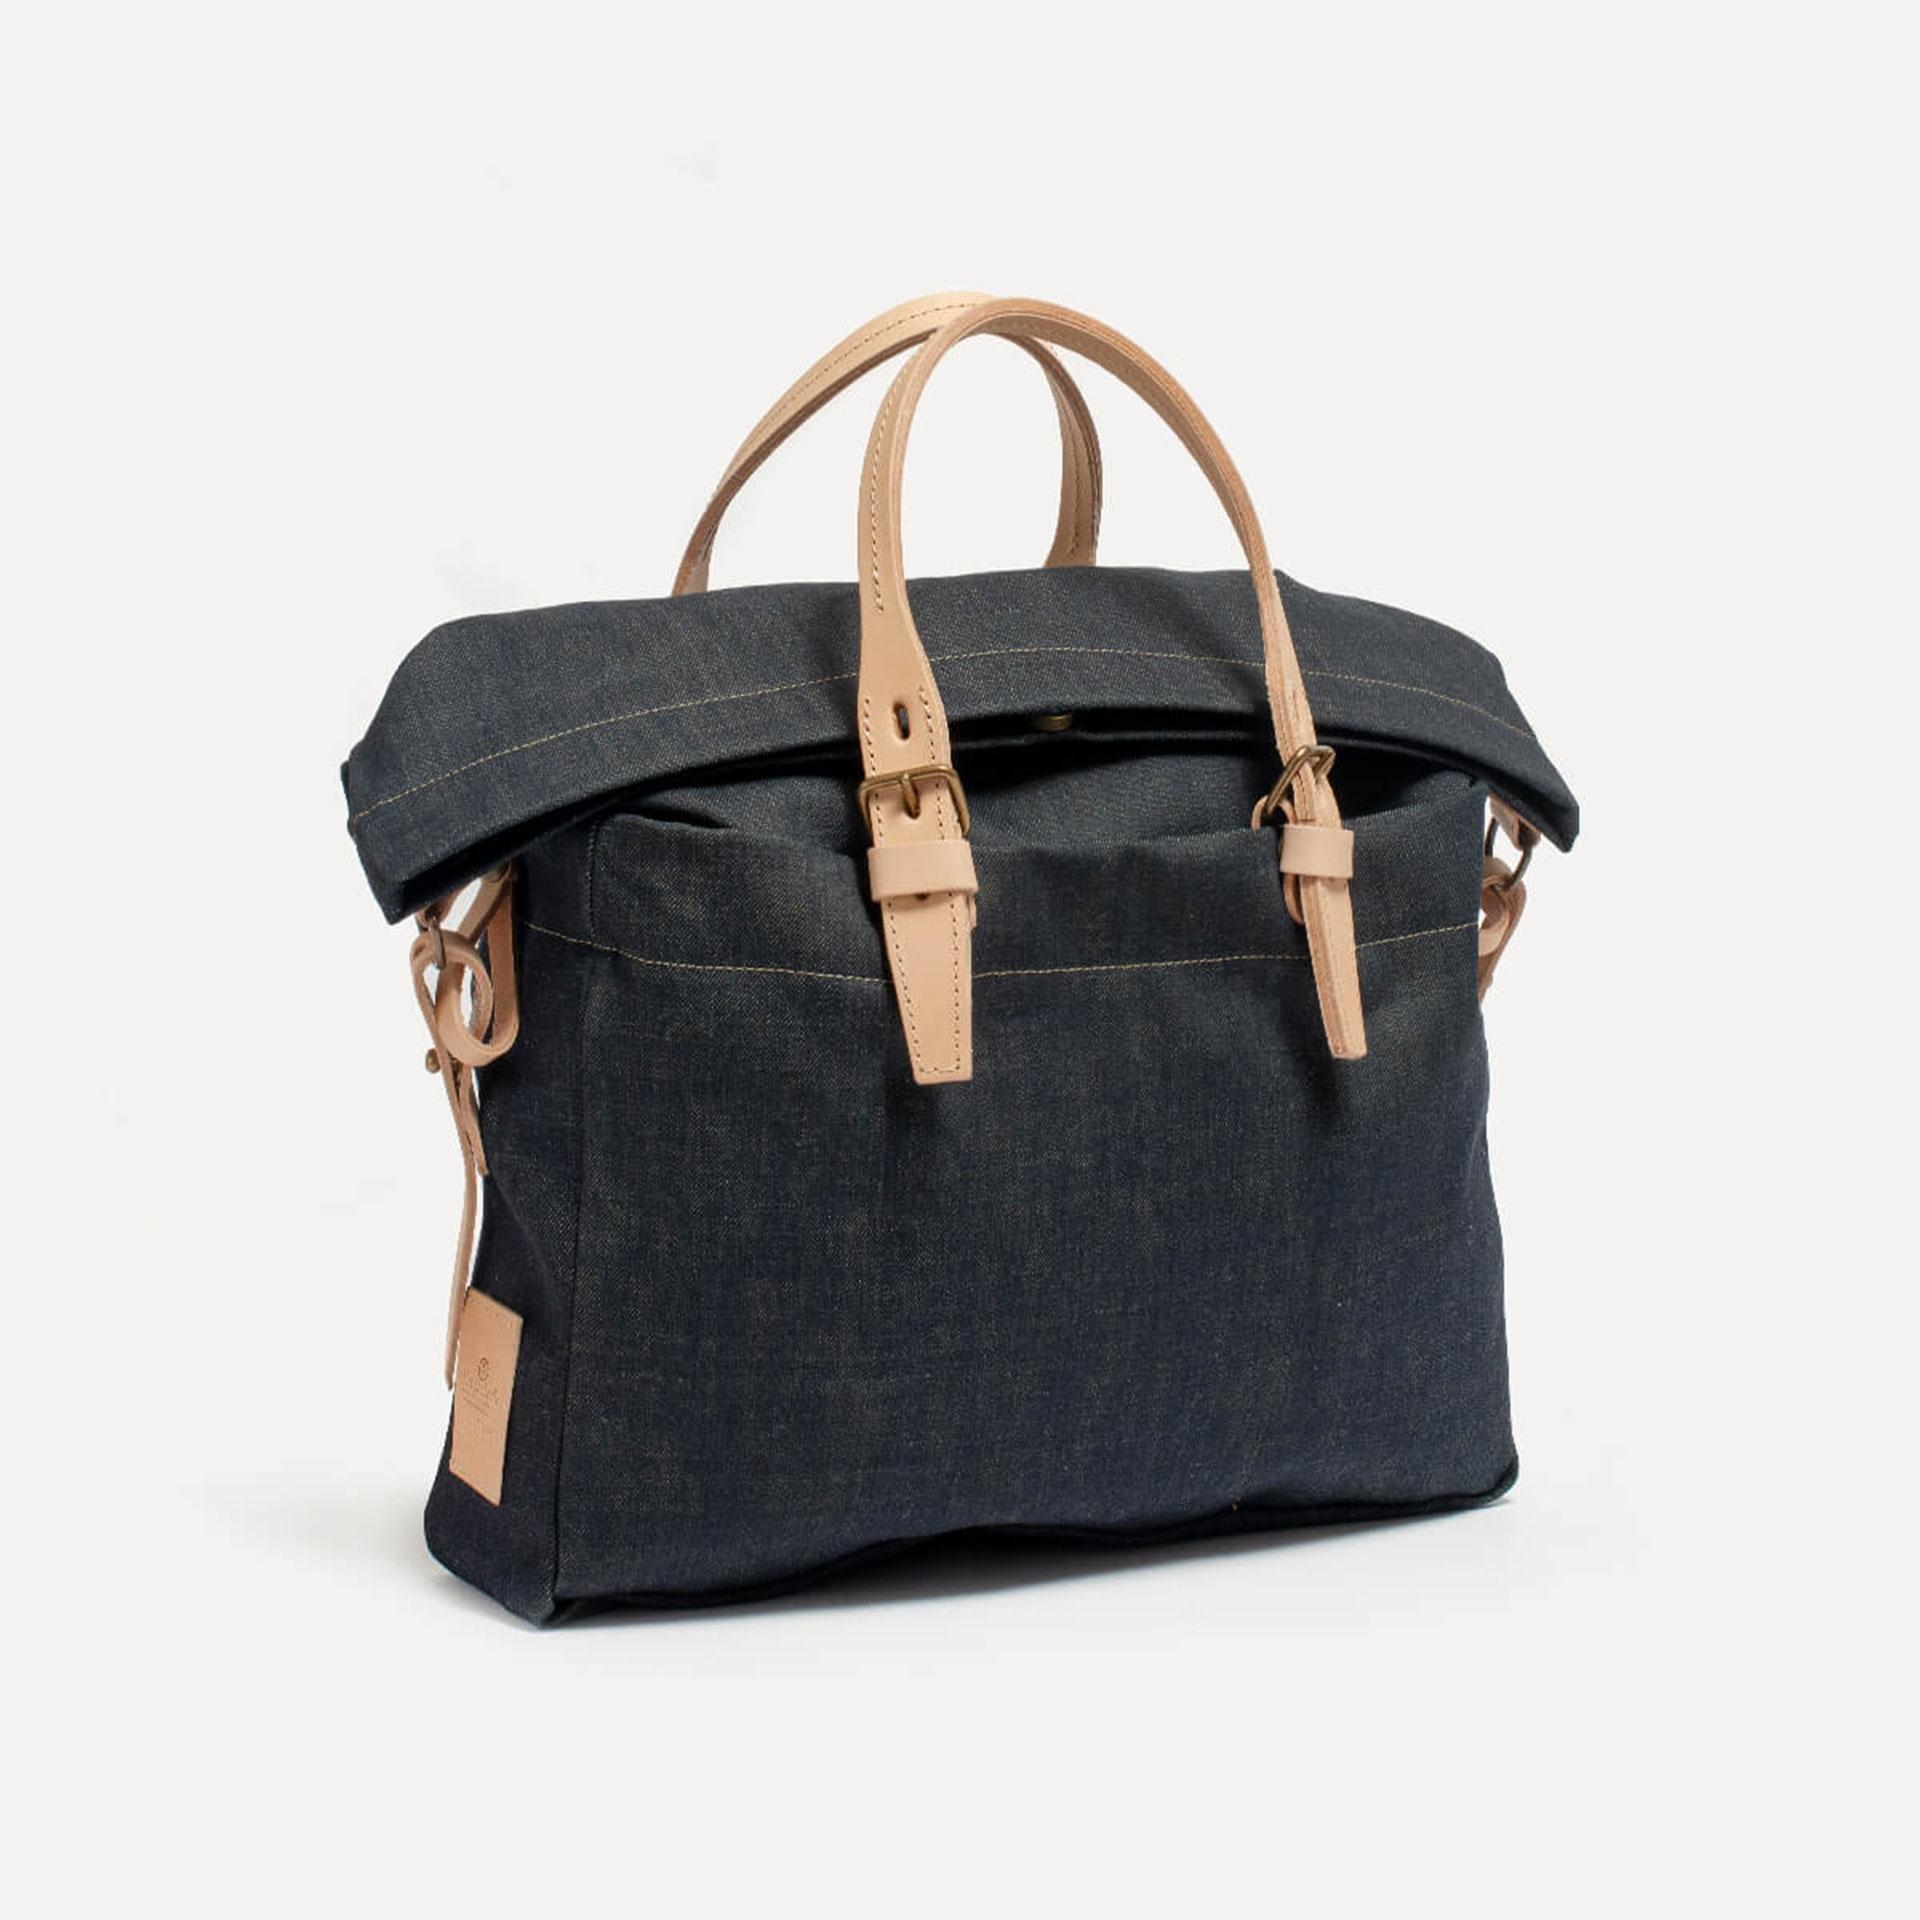 Remix business bag - BDC x Raleigh denim (image n°2)